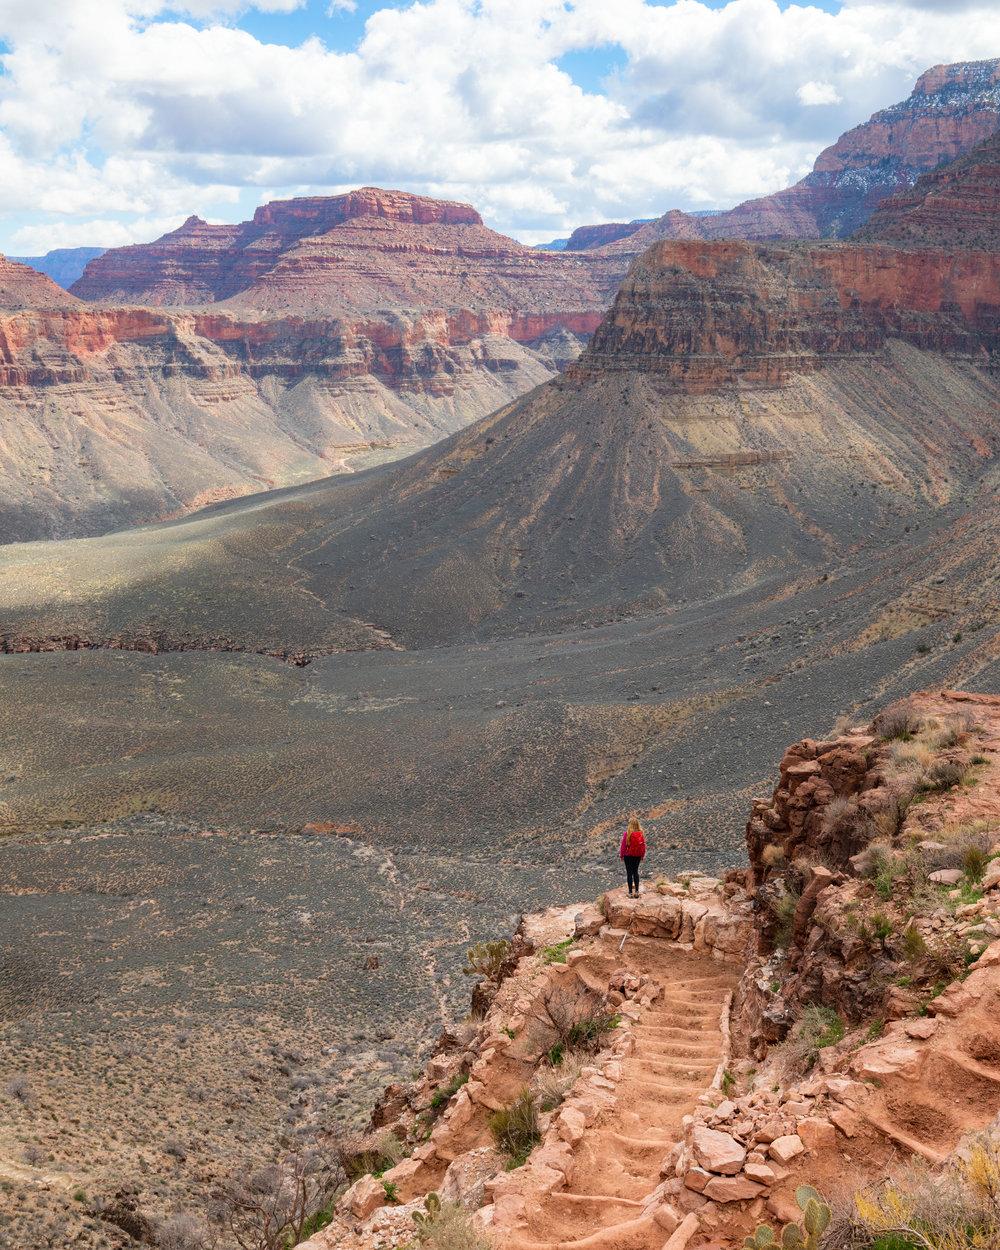 The trail to Phantom Ranch